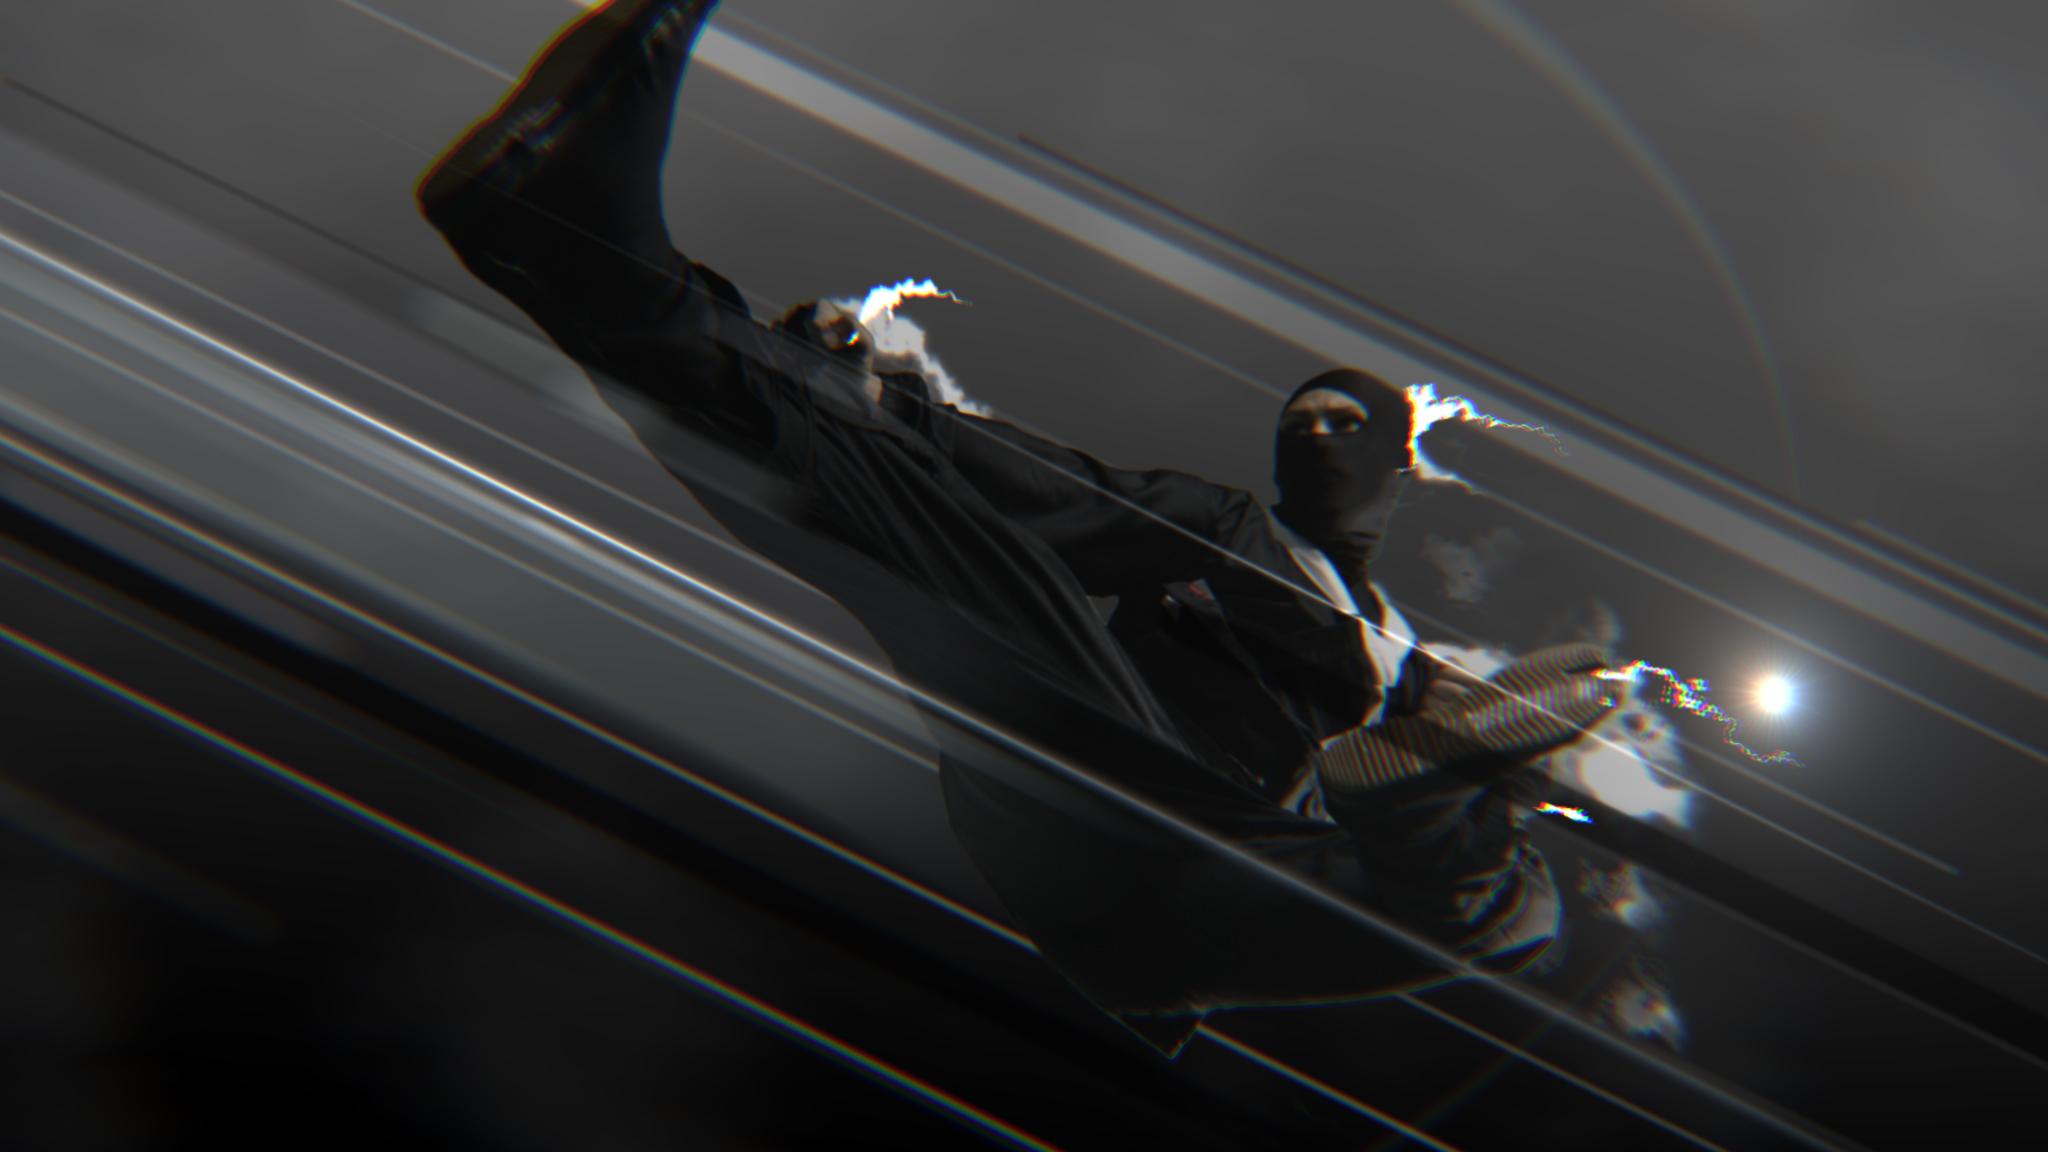 A002C007-BlackHERO_810974.jpg